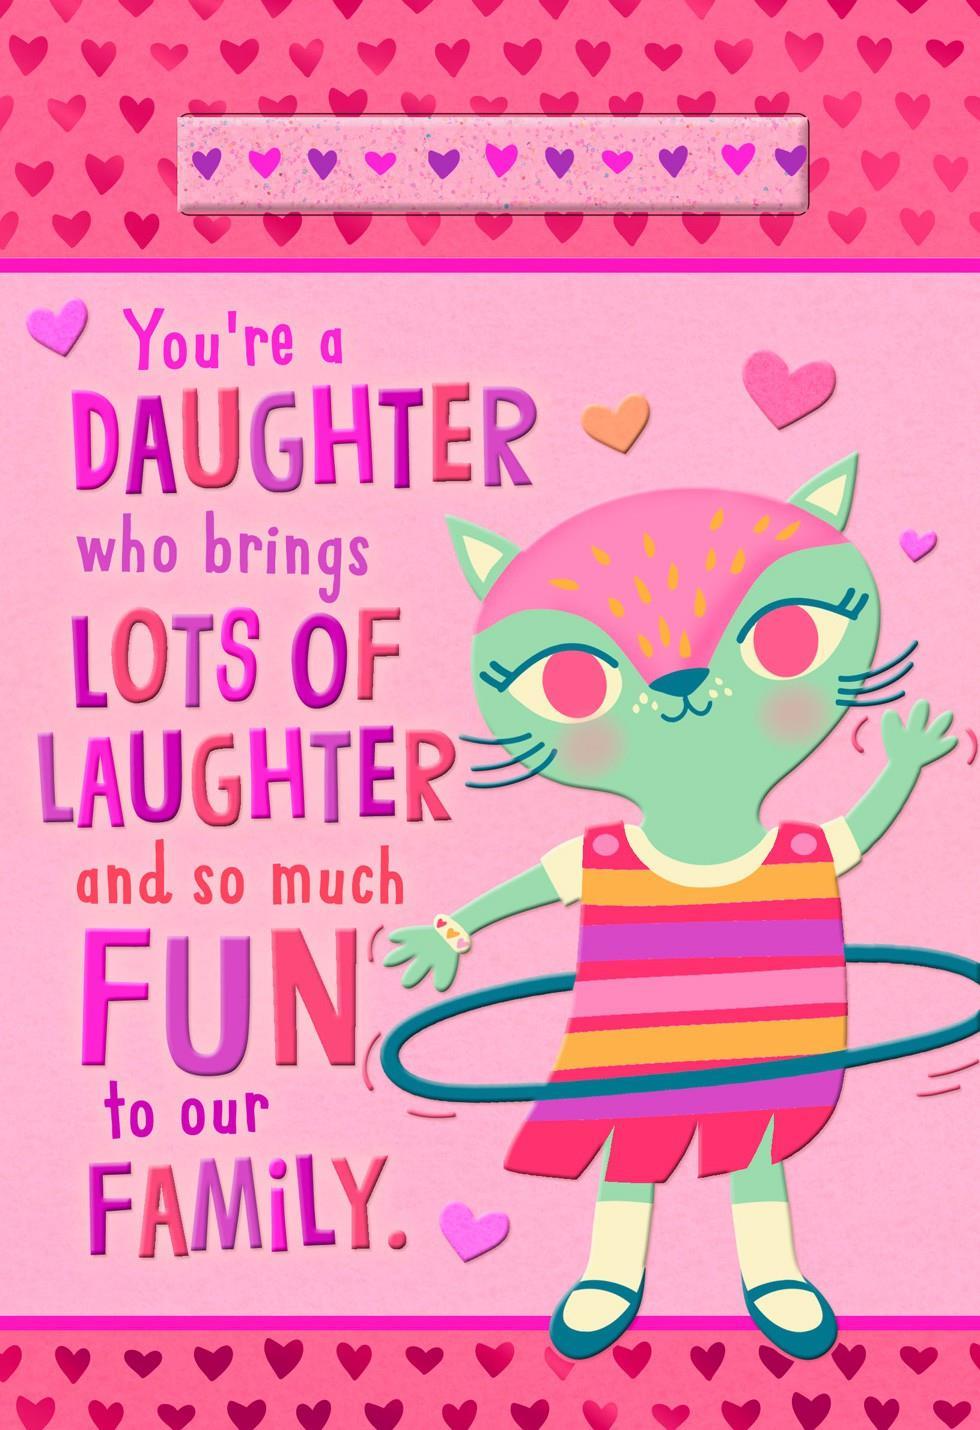 glitter bracelet valentines day card for daughter greeting cards hallmark